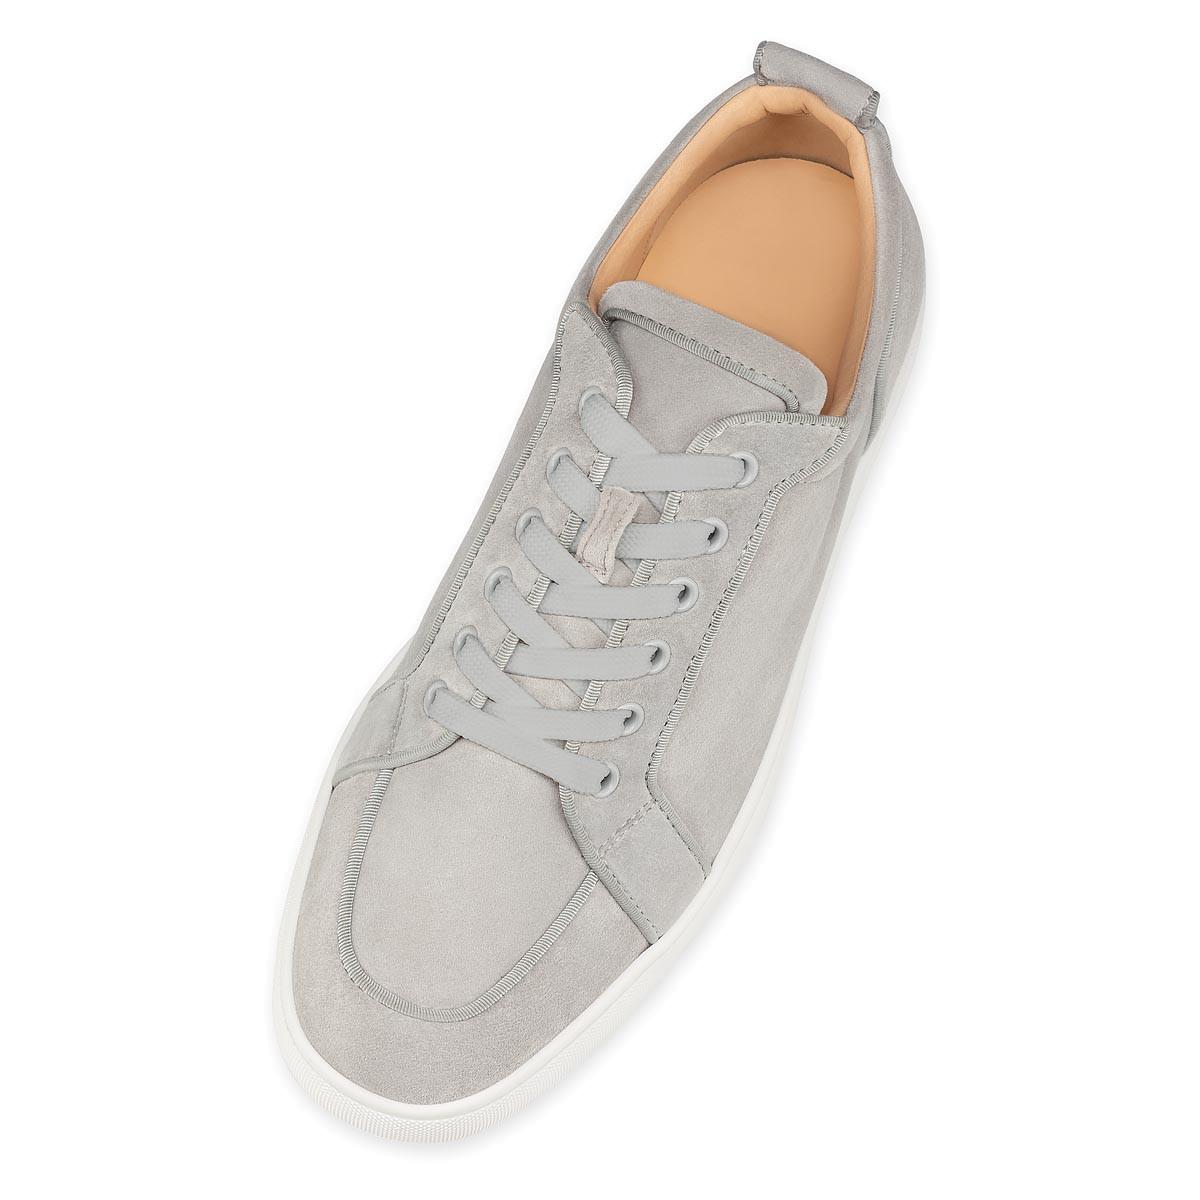 Shoes - Rantulow Orlato - Christian Louboutin